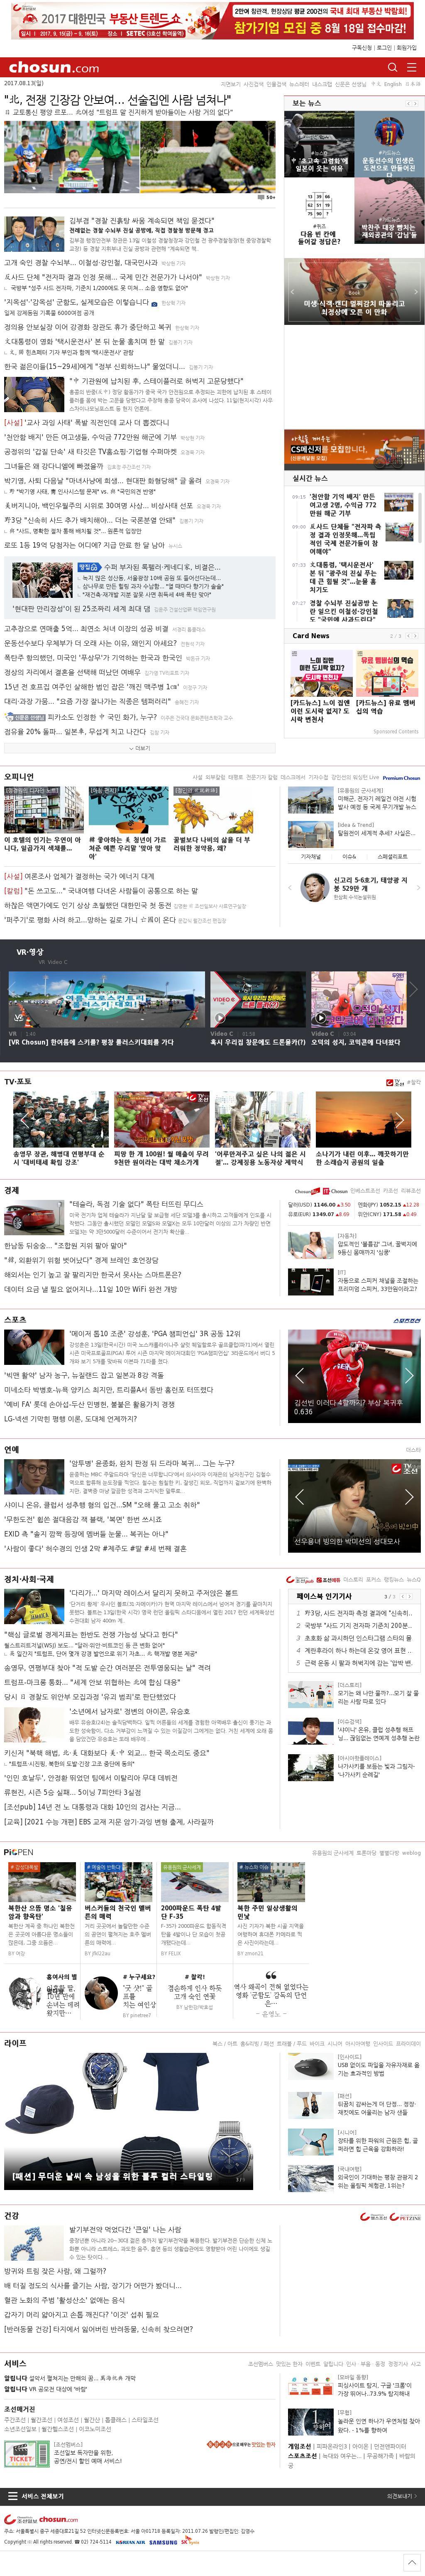 chosun.com at Sunday Aug. 13, 2017, 10:01 a.m. UTC